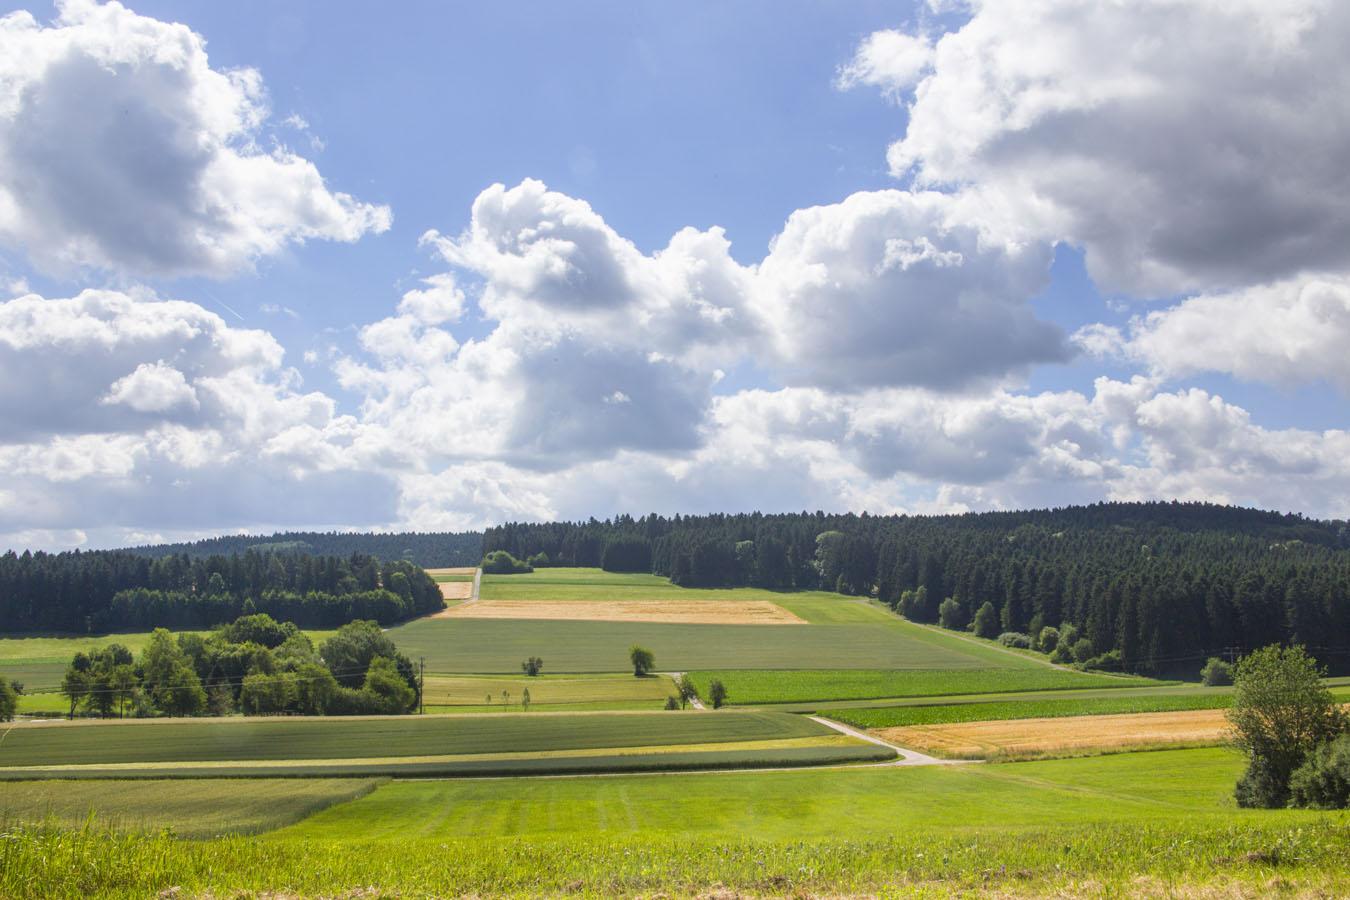 Vom Hörschweiler Industriegebiet Blick ins Tal